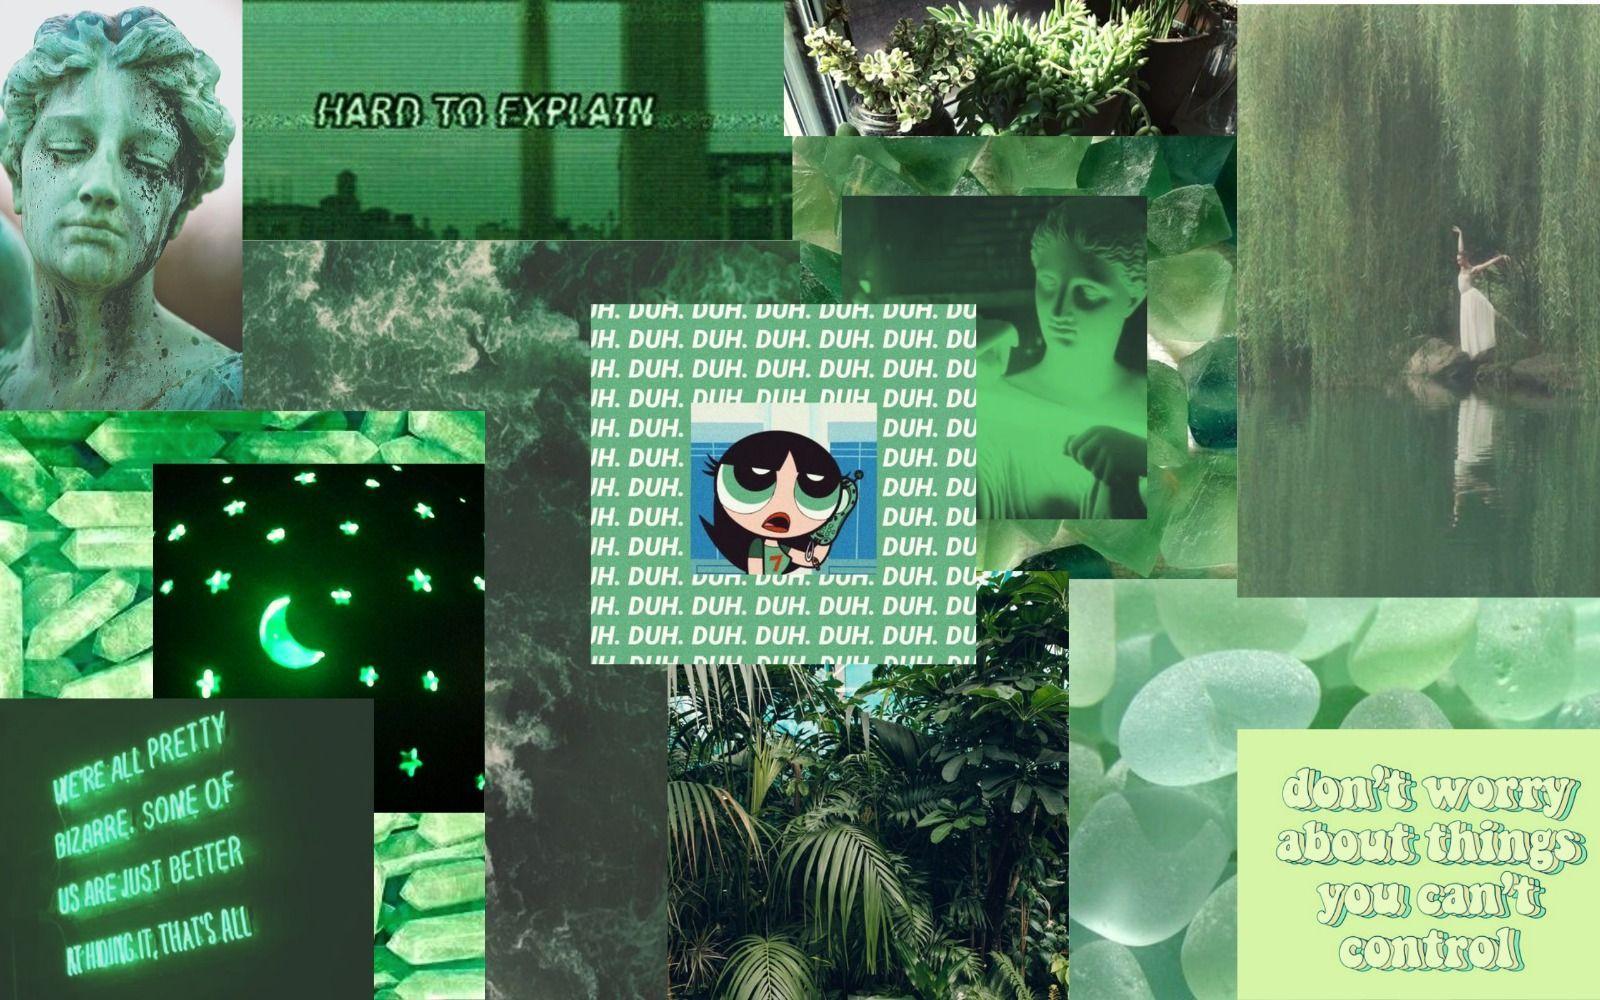 Aesthetic islamic quotes tumblr wallpaper; Green Aesthetic Computer Wallpapers - Top Free Green ...